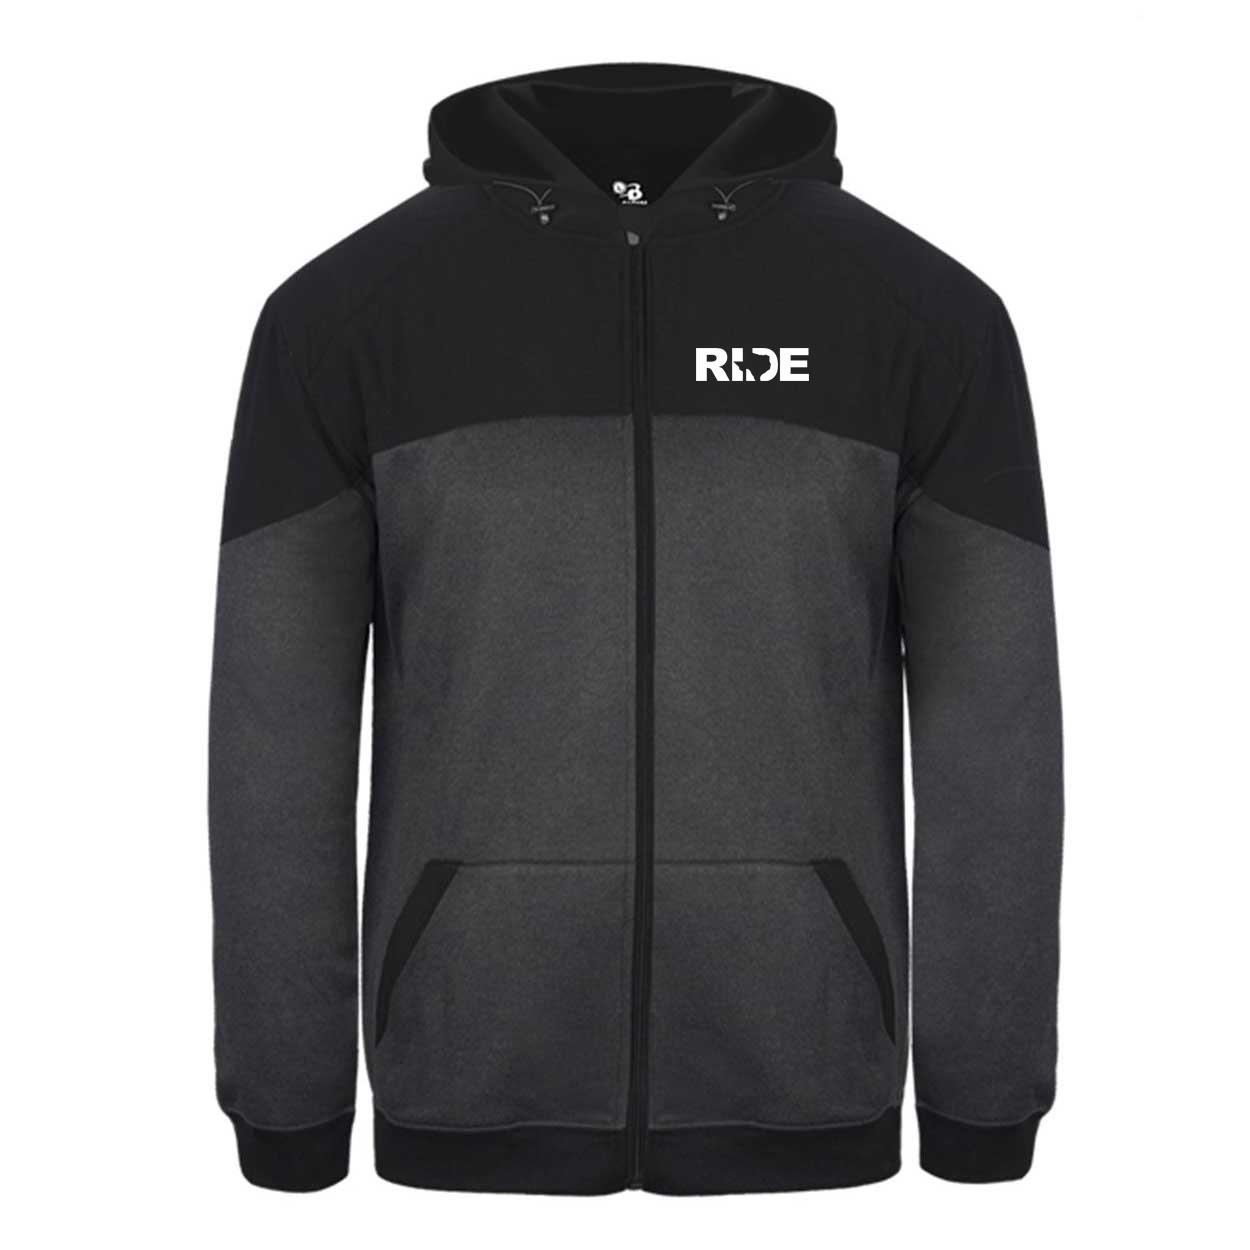 Ride Texas Classic Vindicator Jacket Carbon Heather/Black (White Logo)